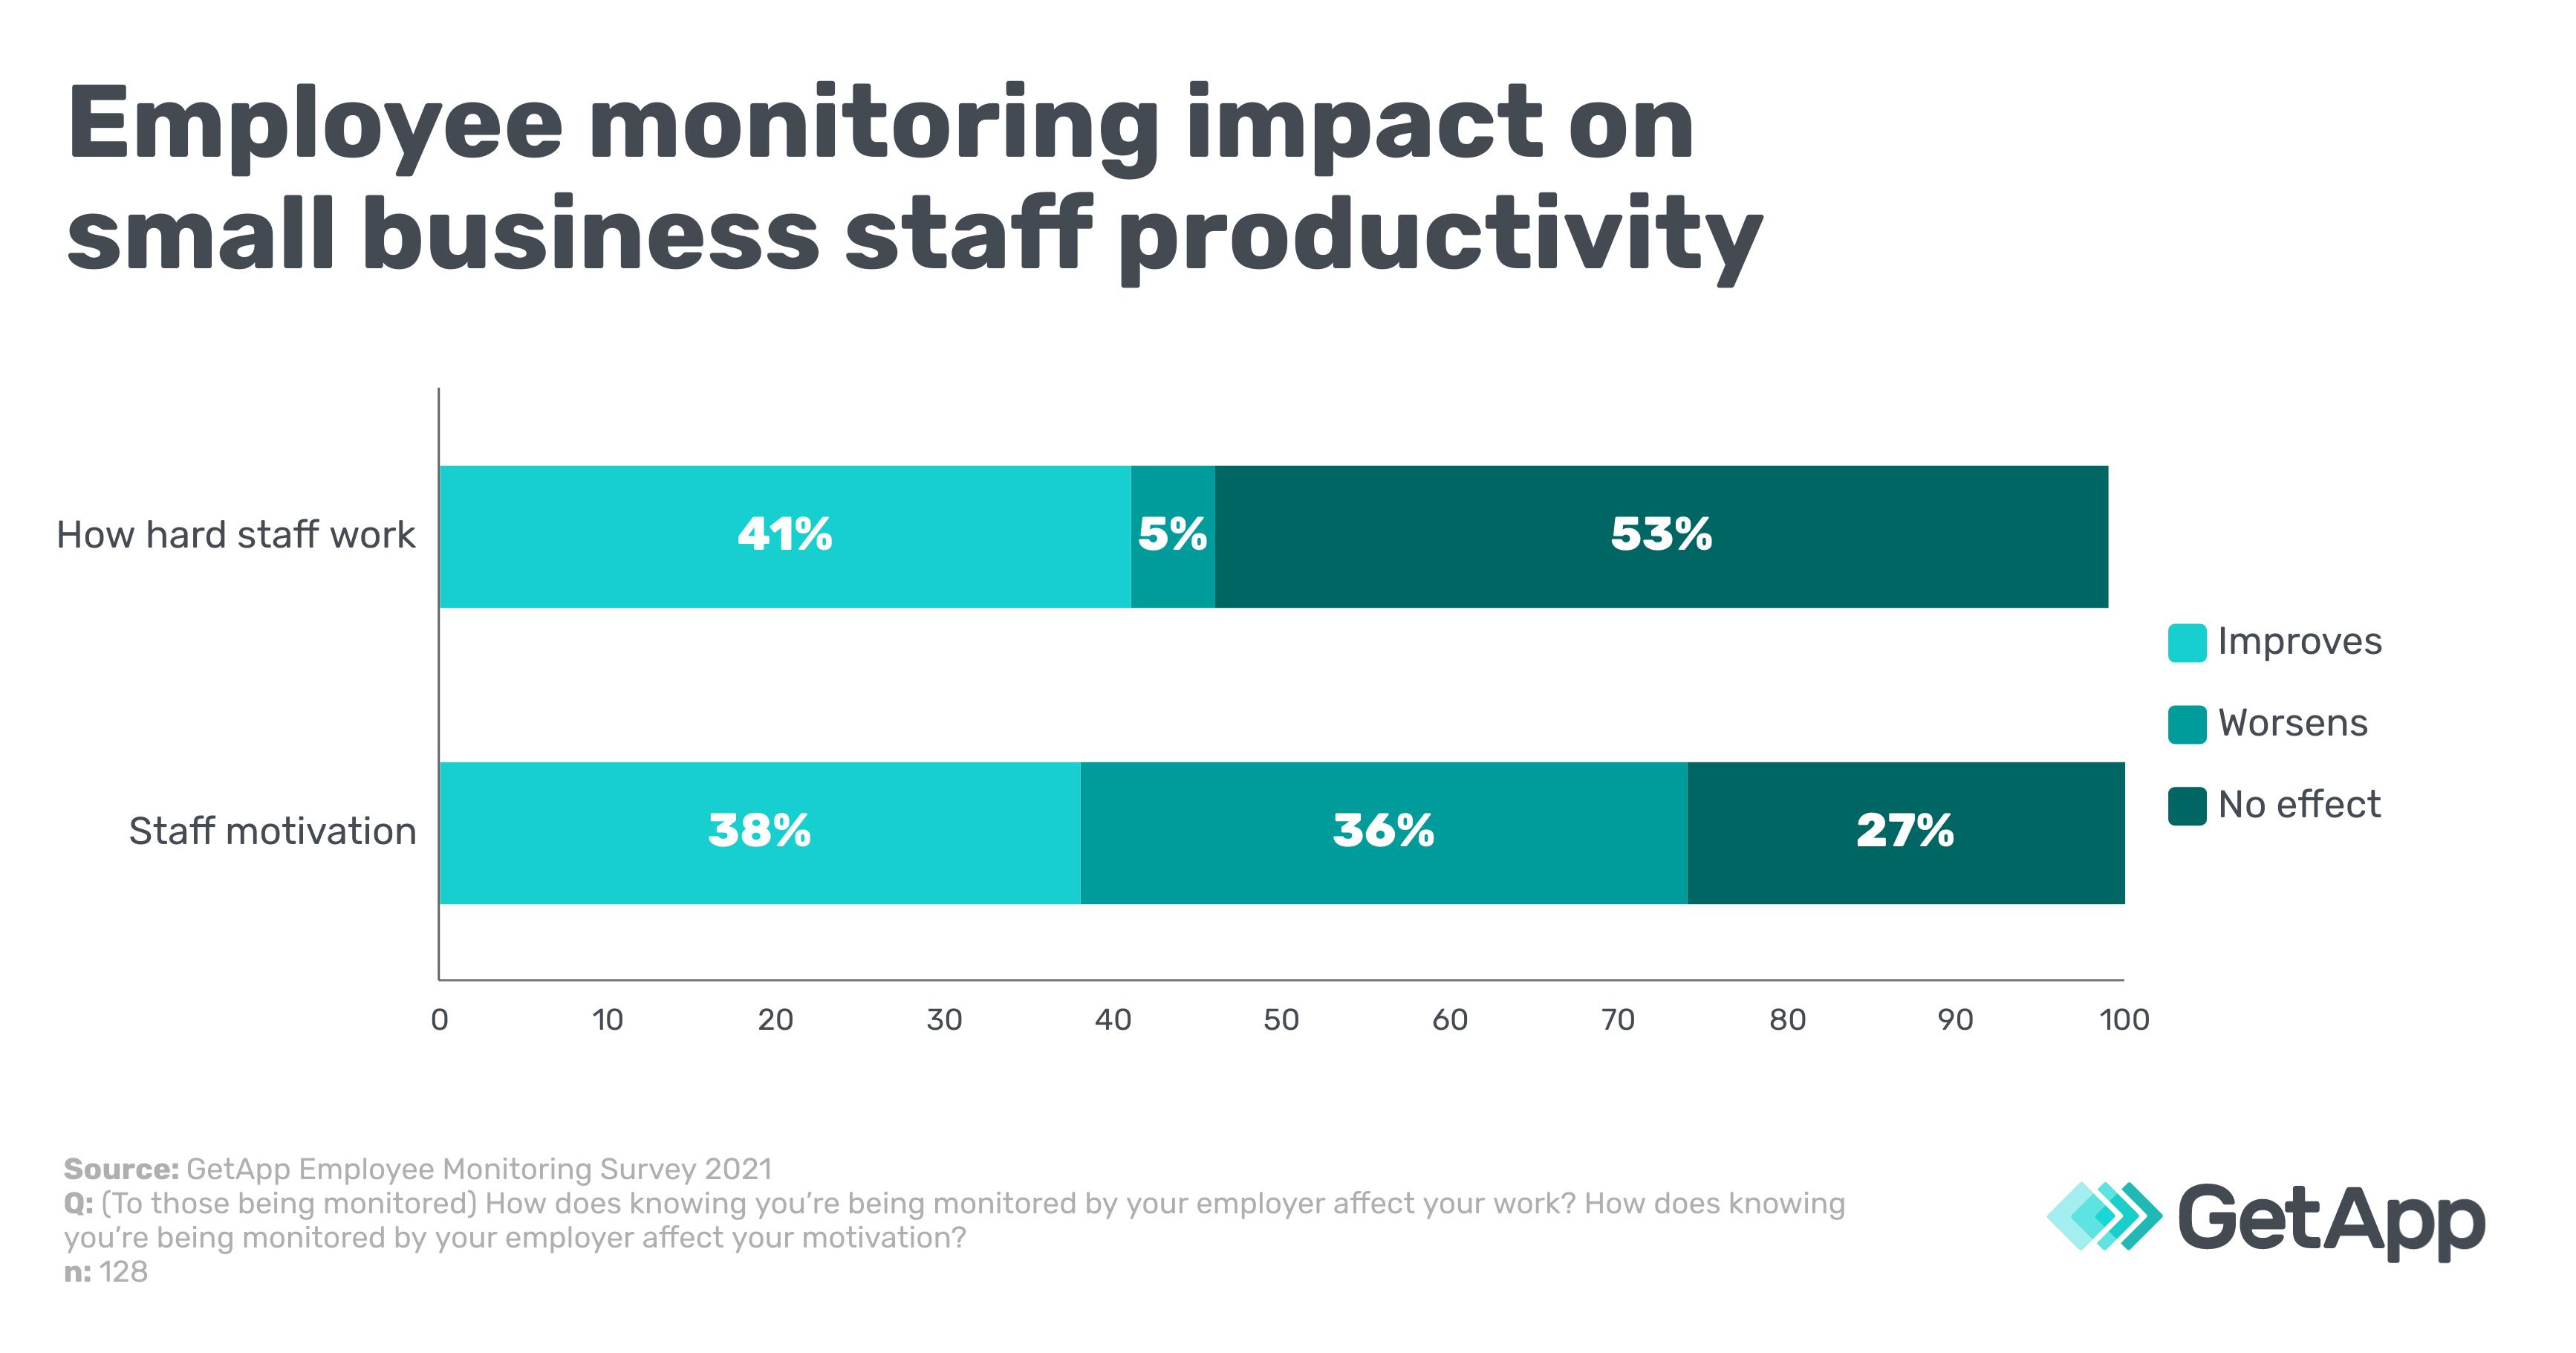 Employee monitoring impact on small business staff productivity